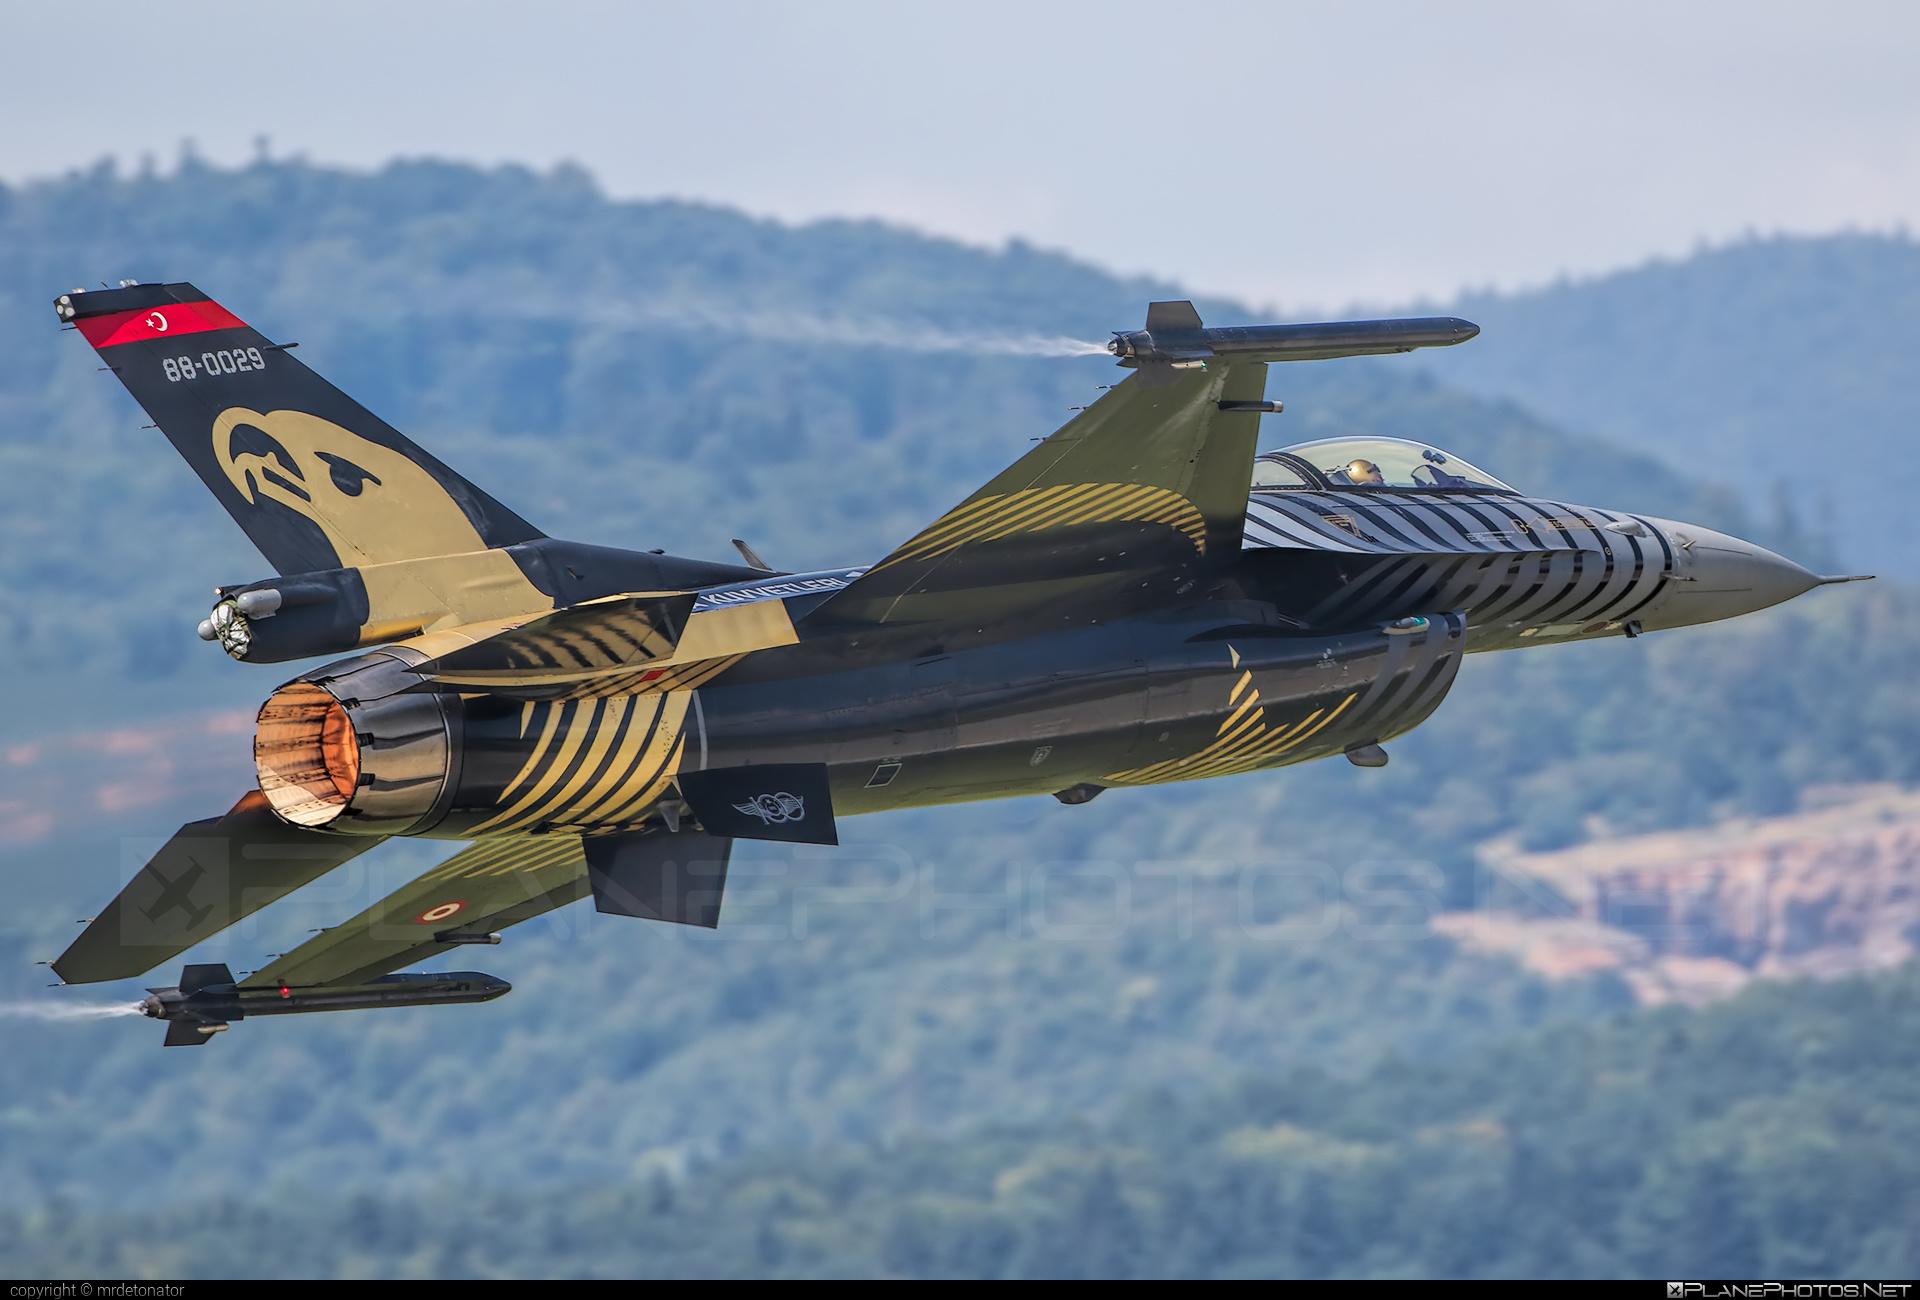 TAI F-16C Fighting Falcon - 88-0029 operated by Türk Hava Kuvvetleri (Turkish Air Force) #f16 #f16c #fightingfalcon #turkishairforce